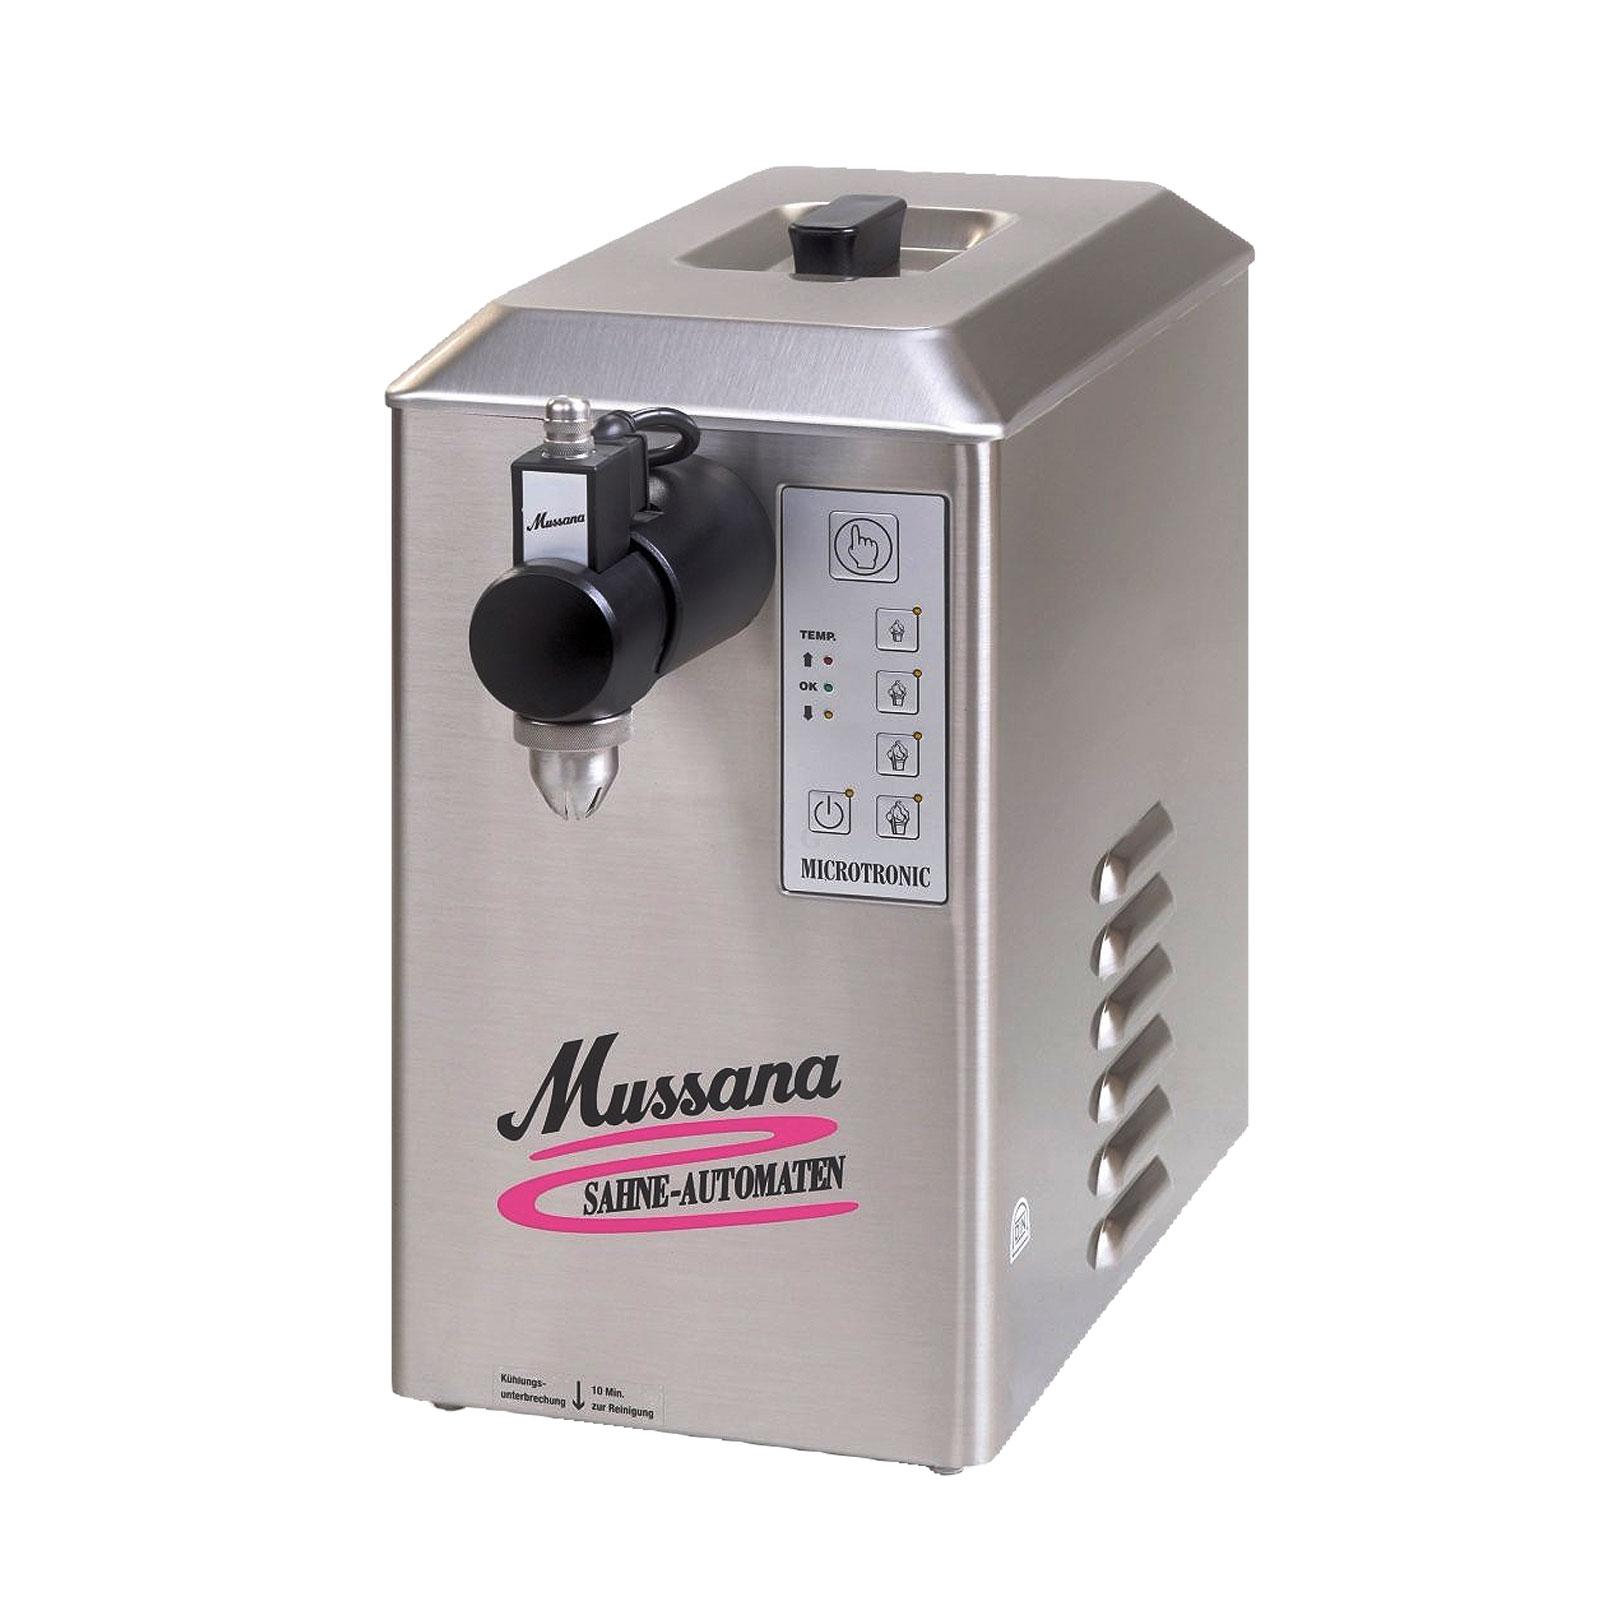 Mussana Pony 2-Liter Sahnemaschine inkl 8l Reiniger